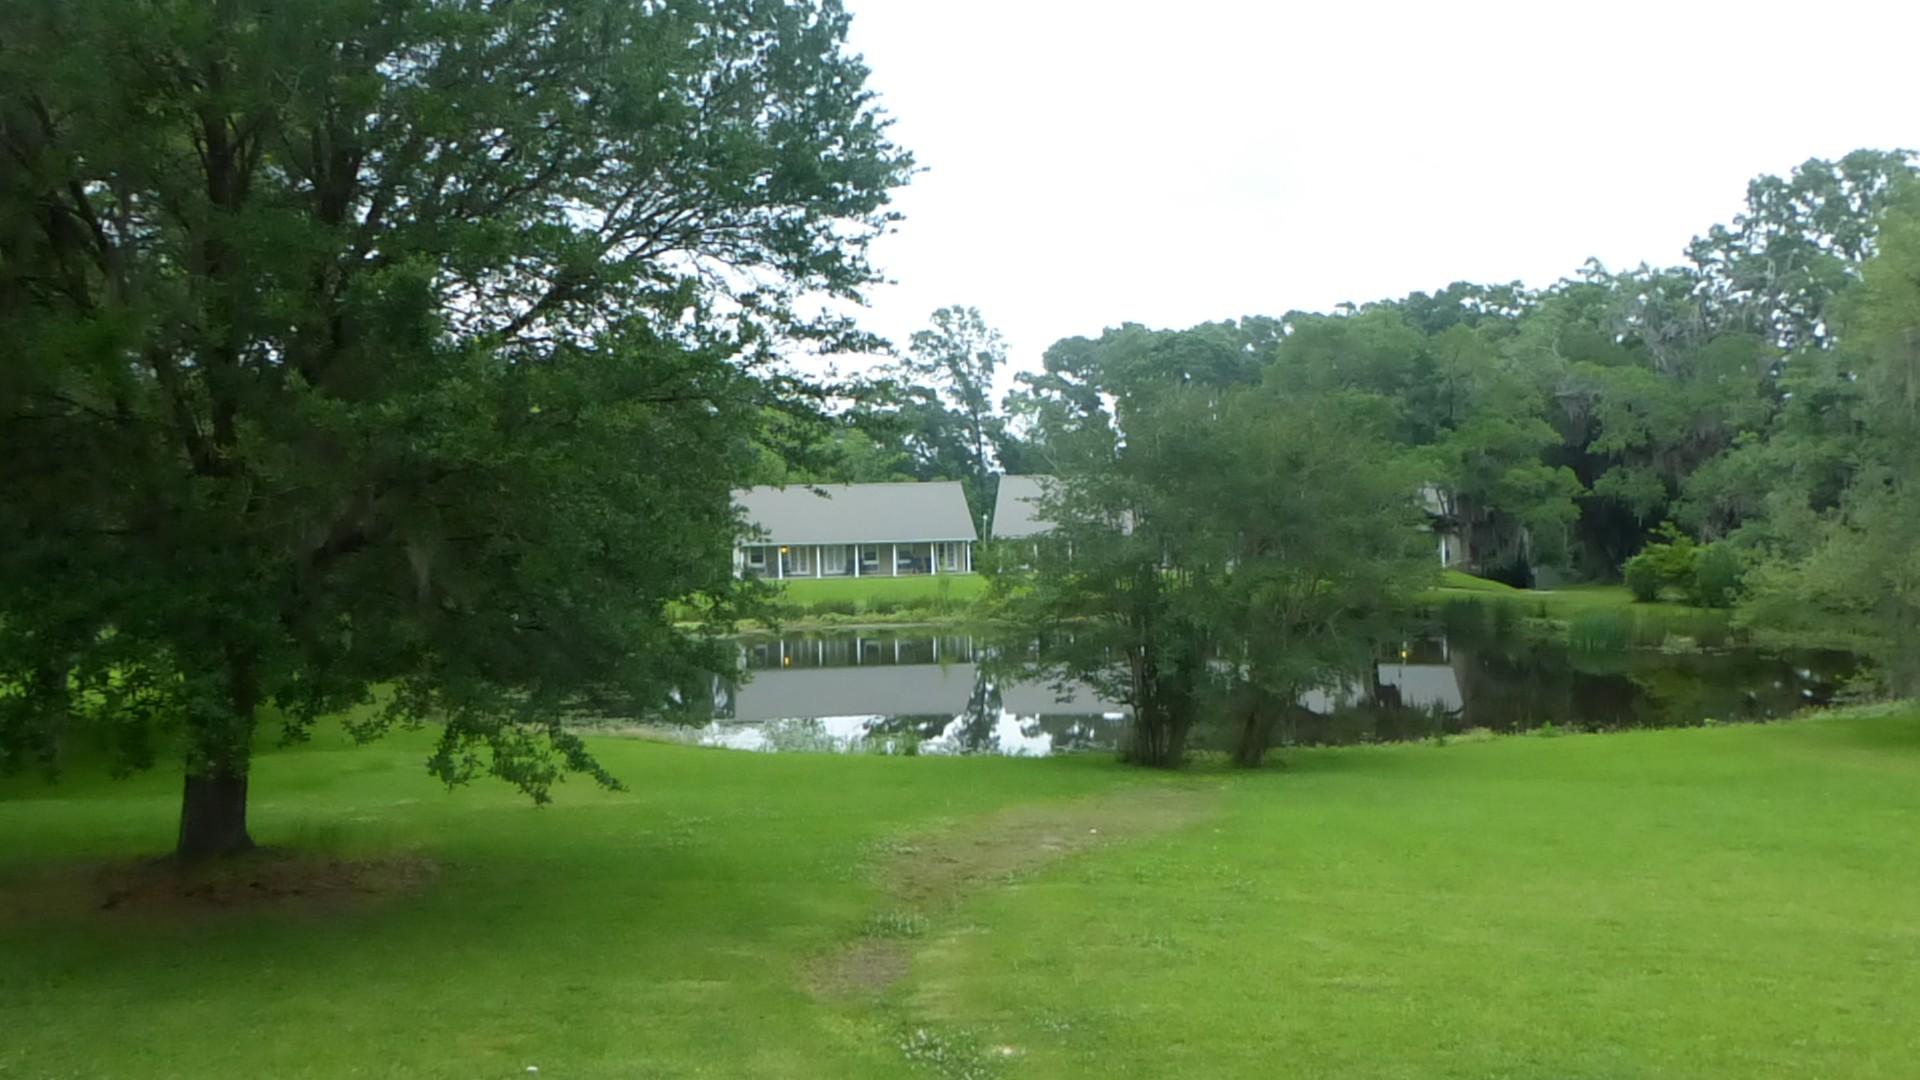 Plantation greenwood, l'étang et les chambres d'hôtes